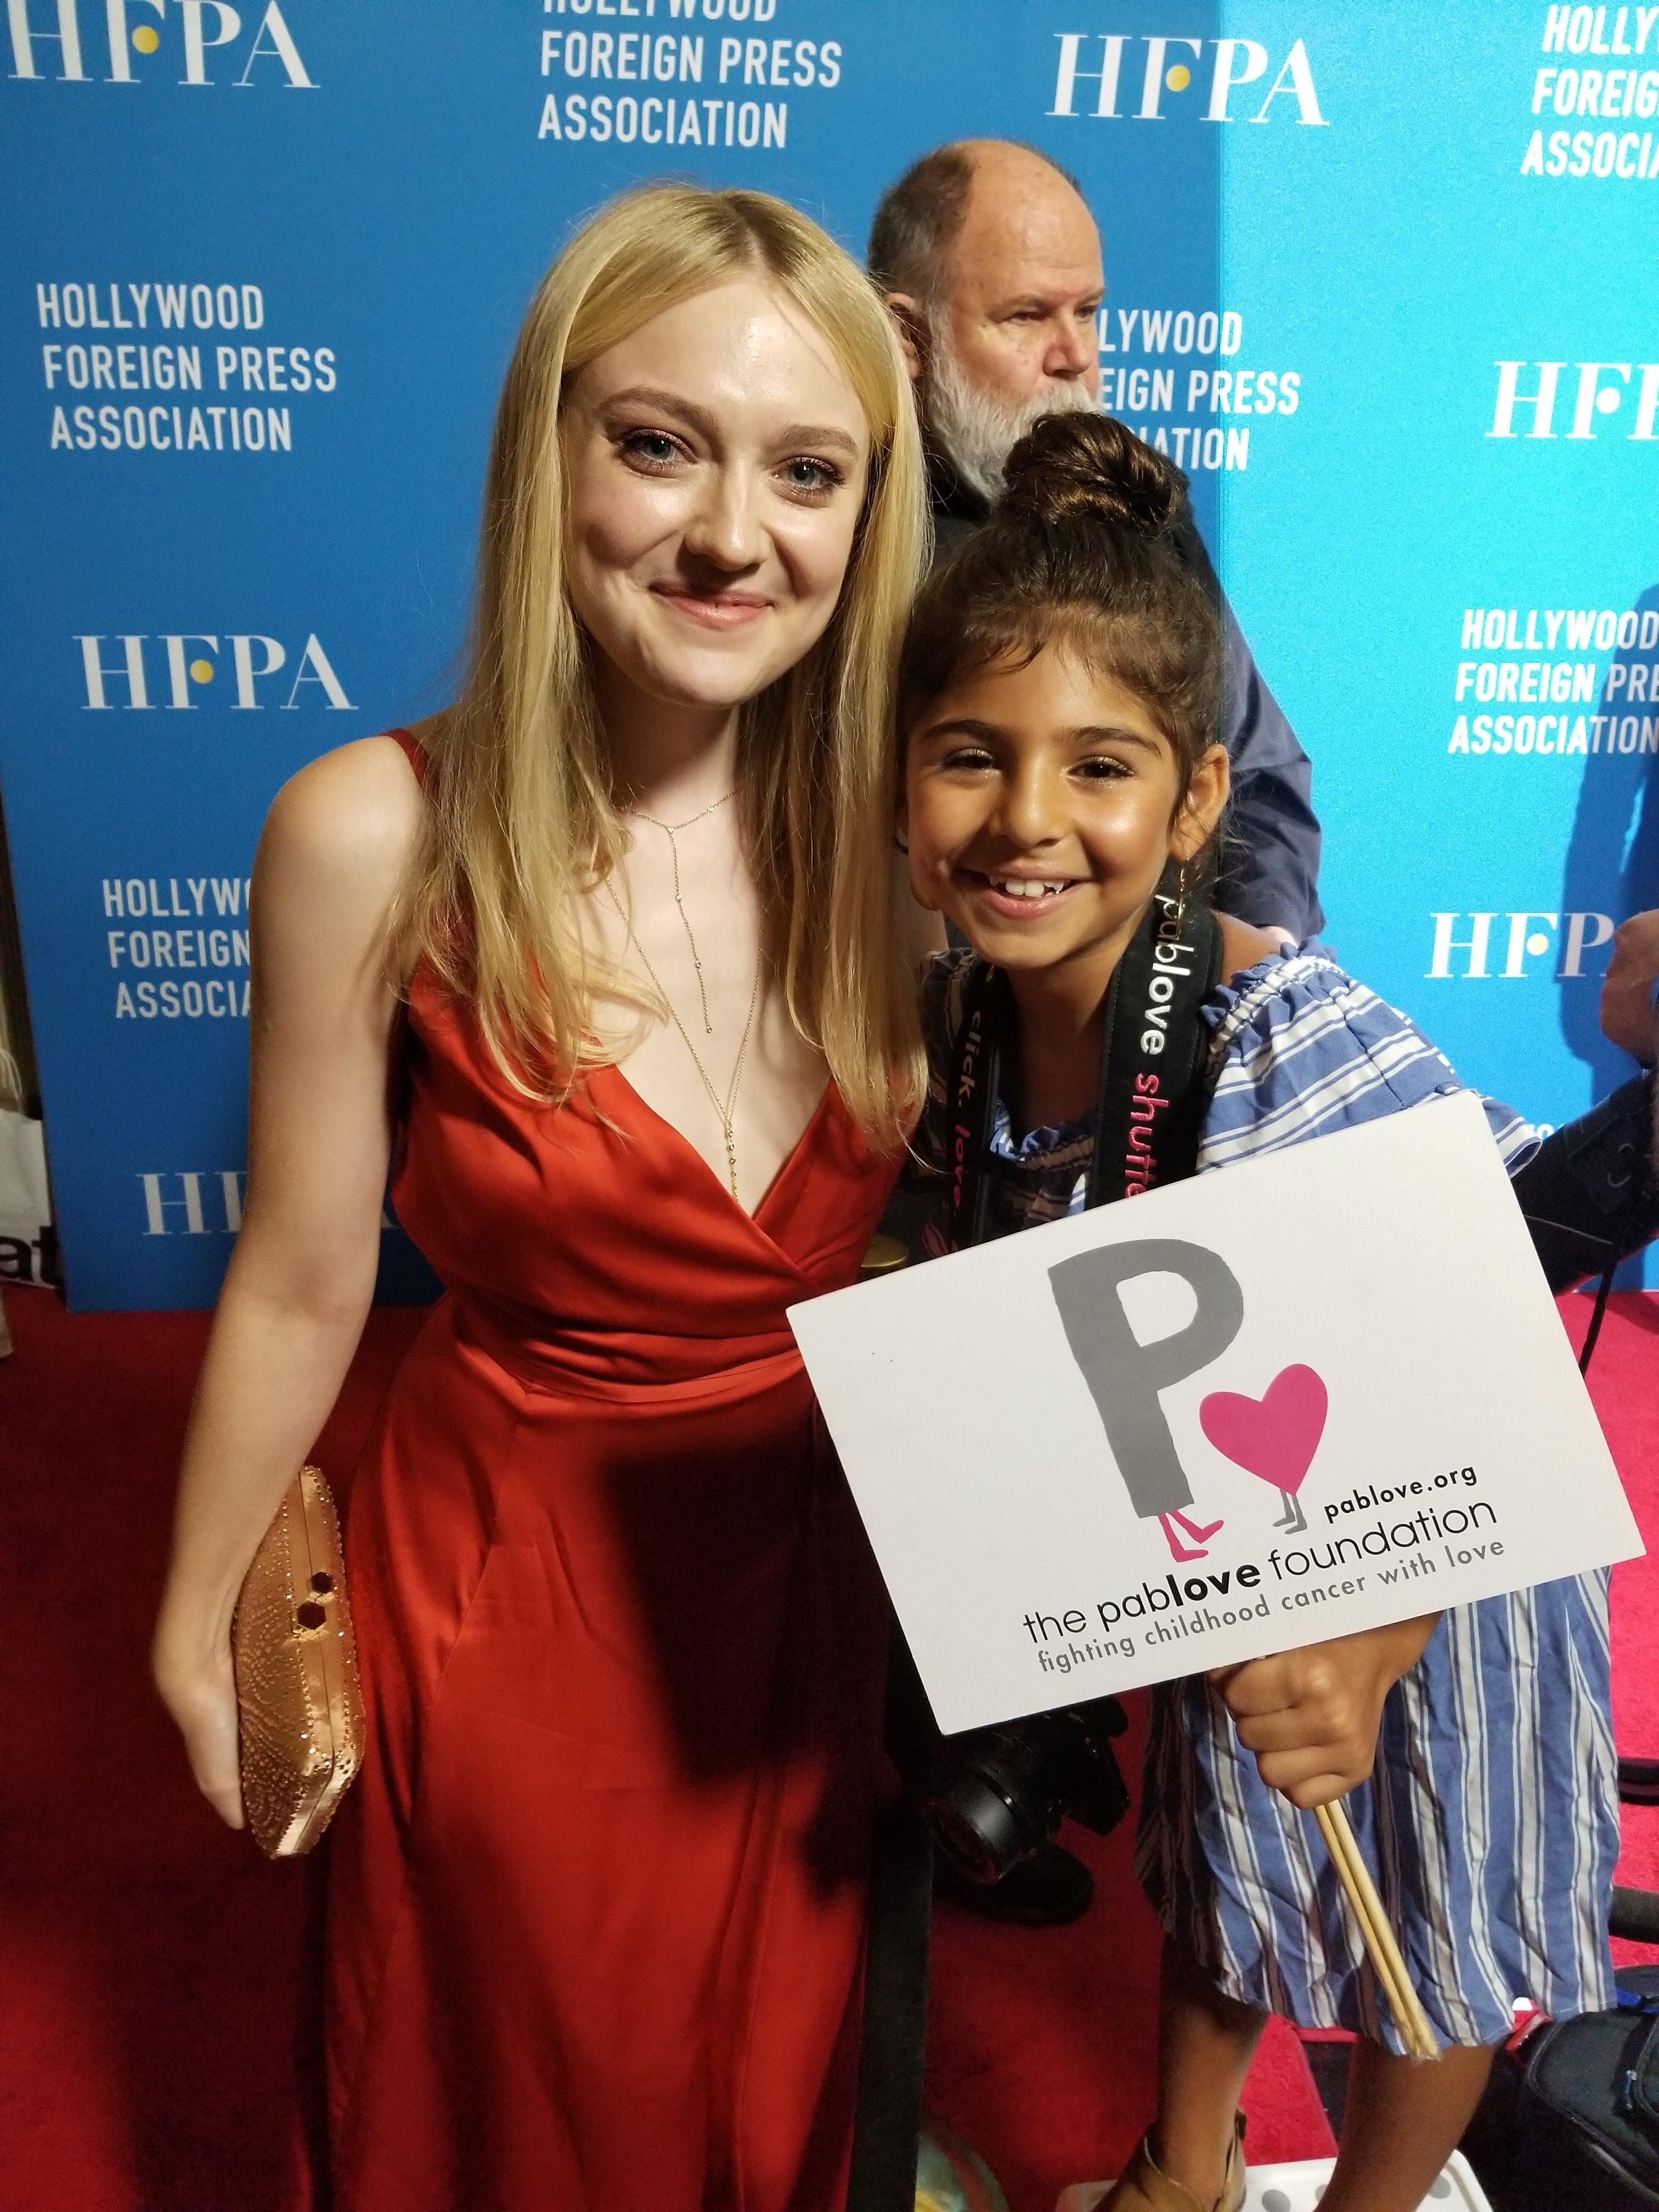 Yasmine, a Pablolove Shutterbug, at the HFPA Grants Banquet 2018, wit Dakota Fanning